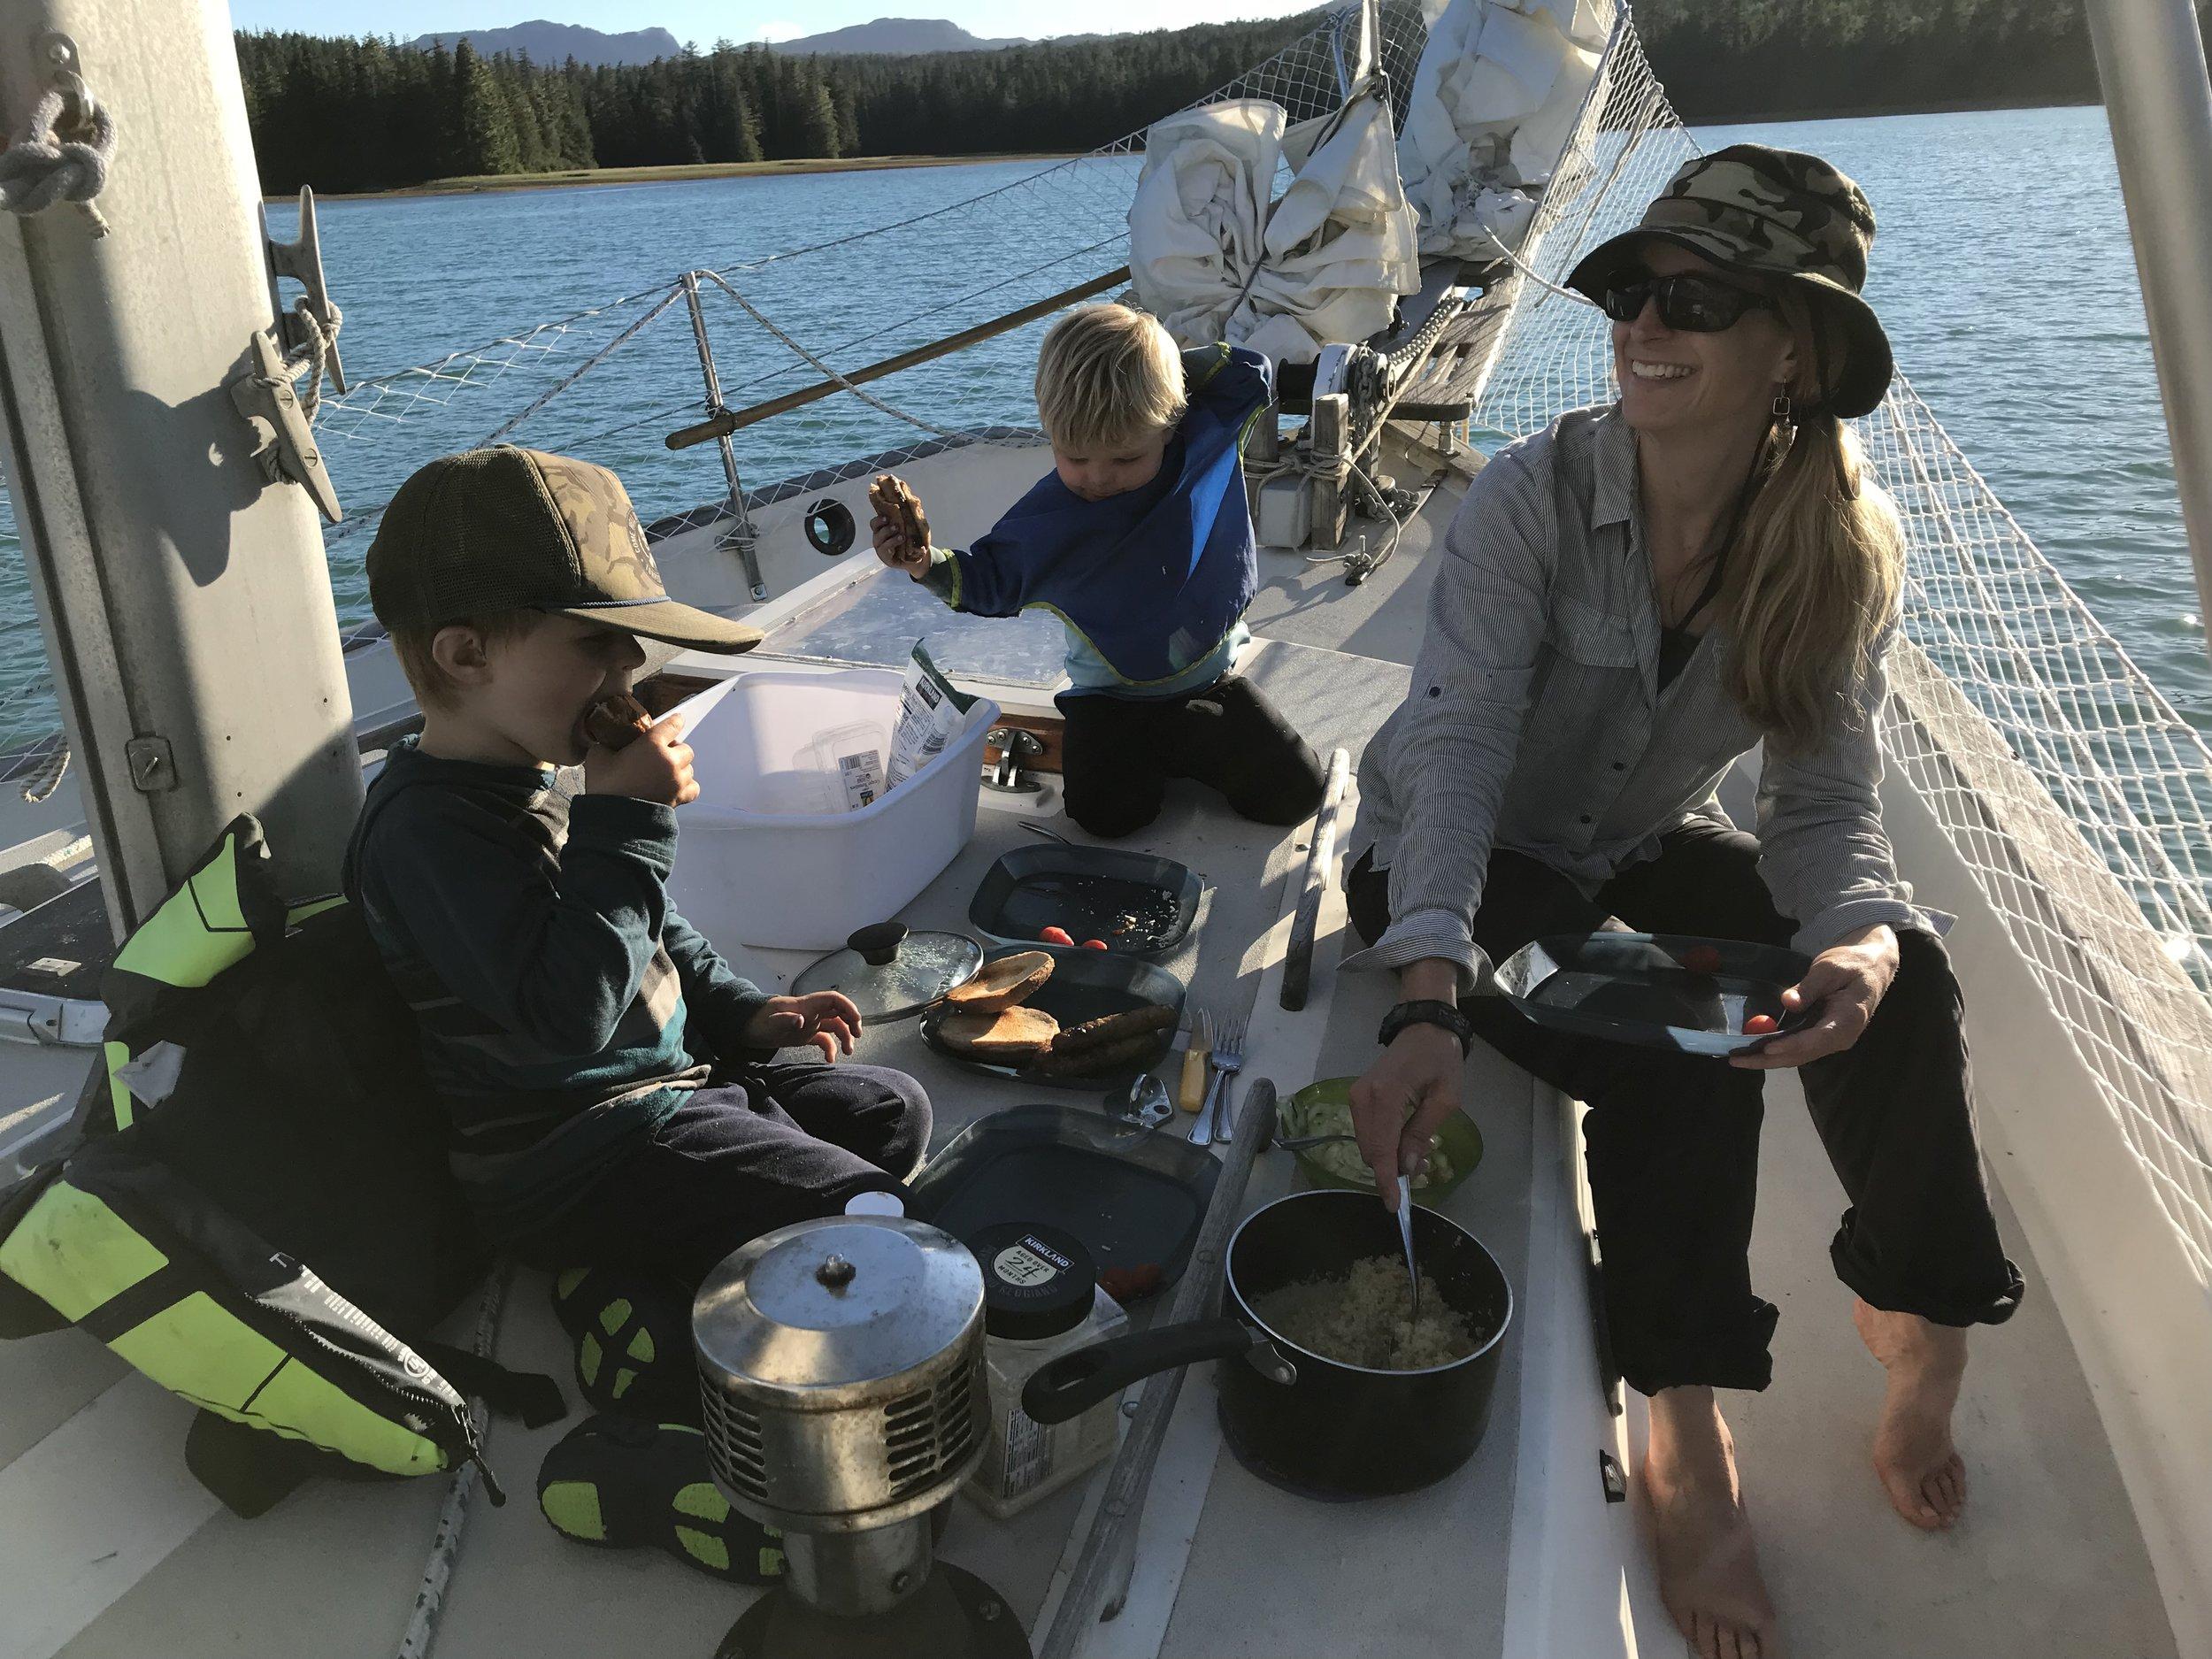 Dining on deck.